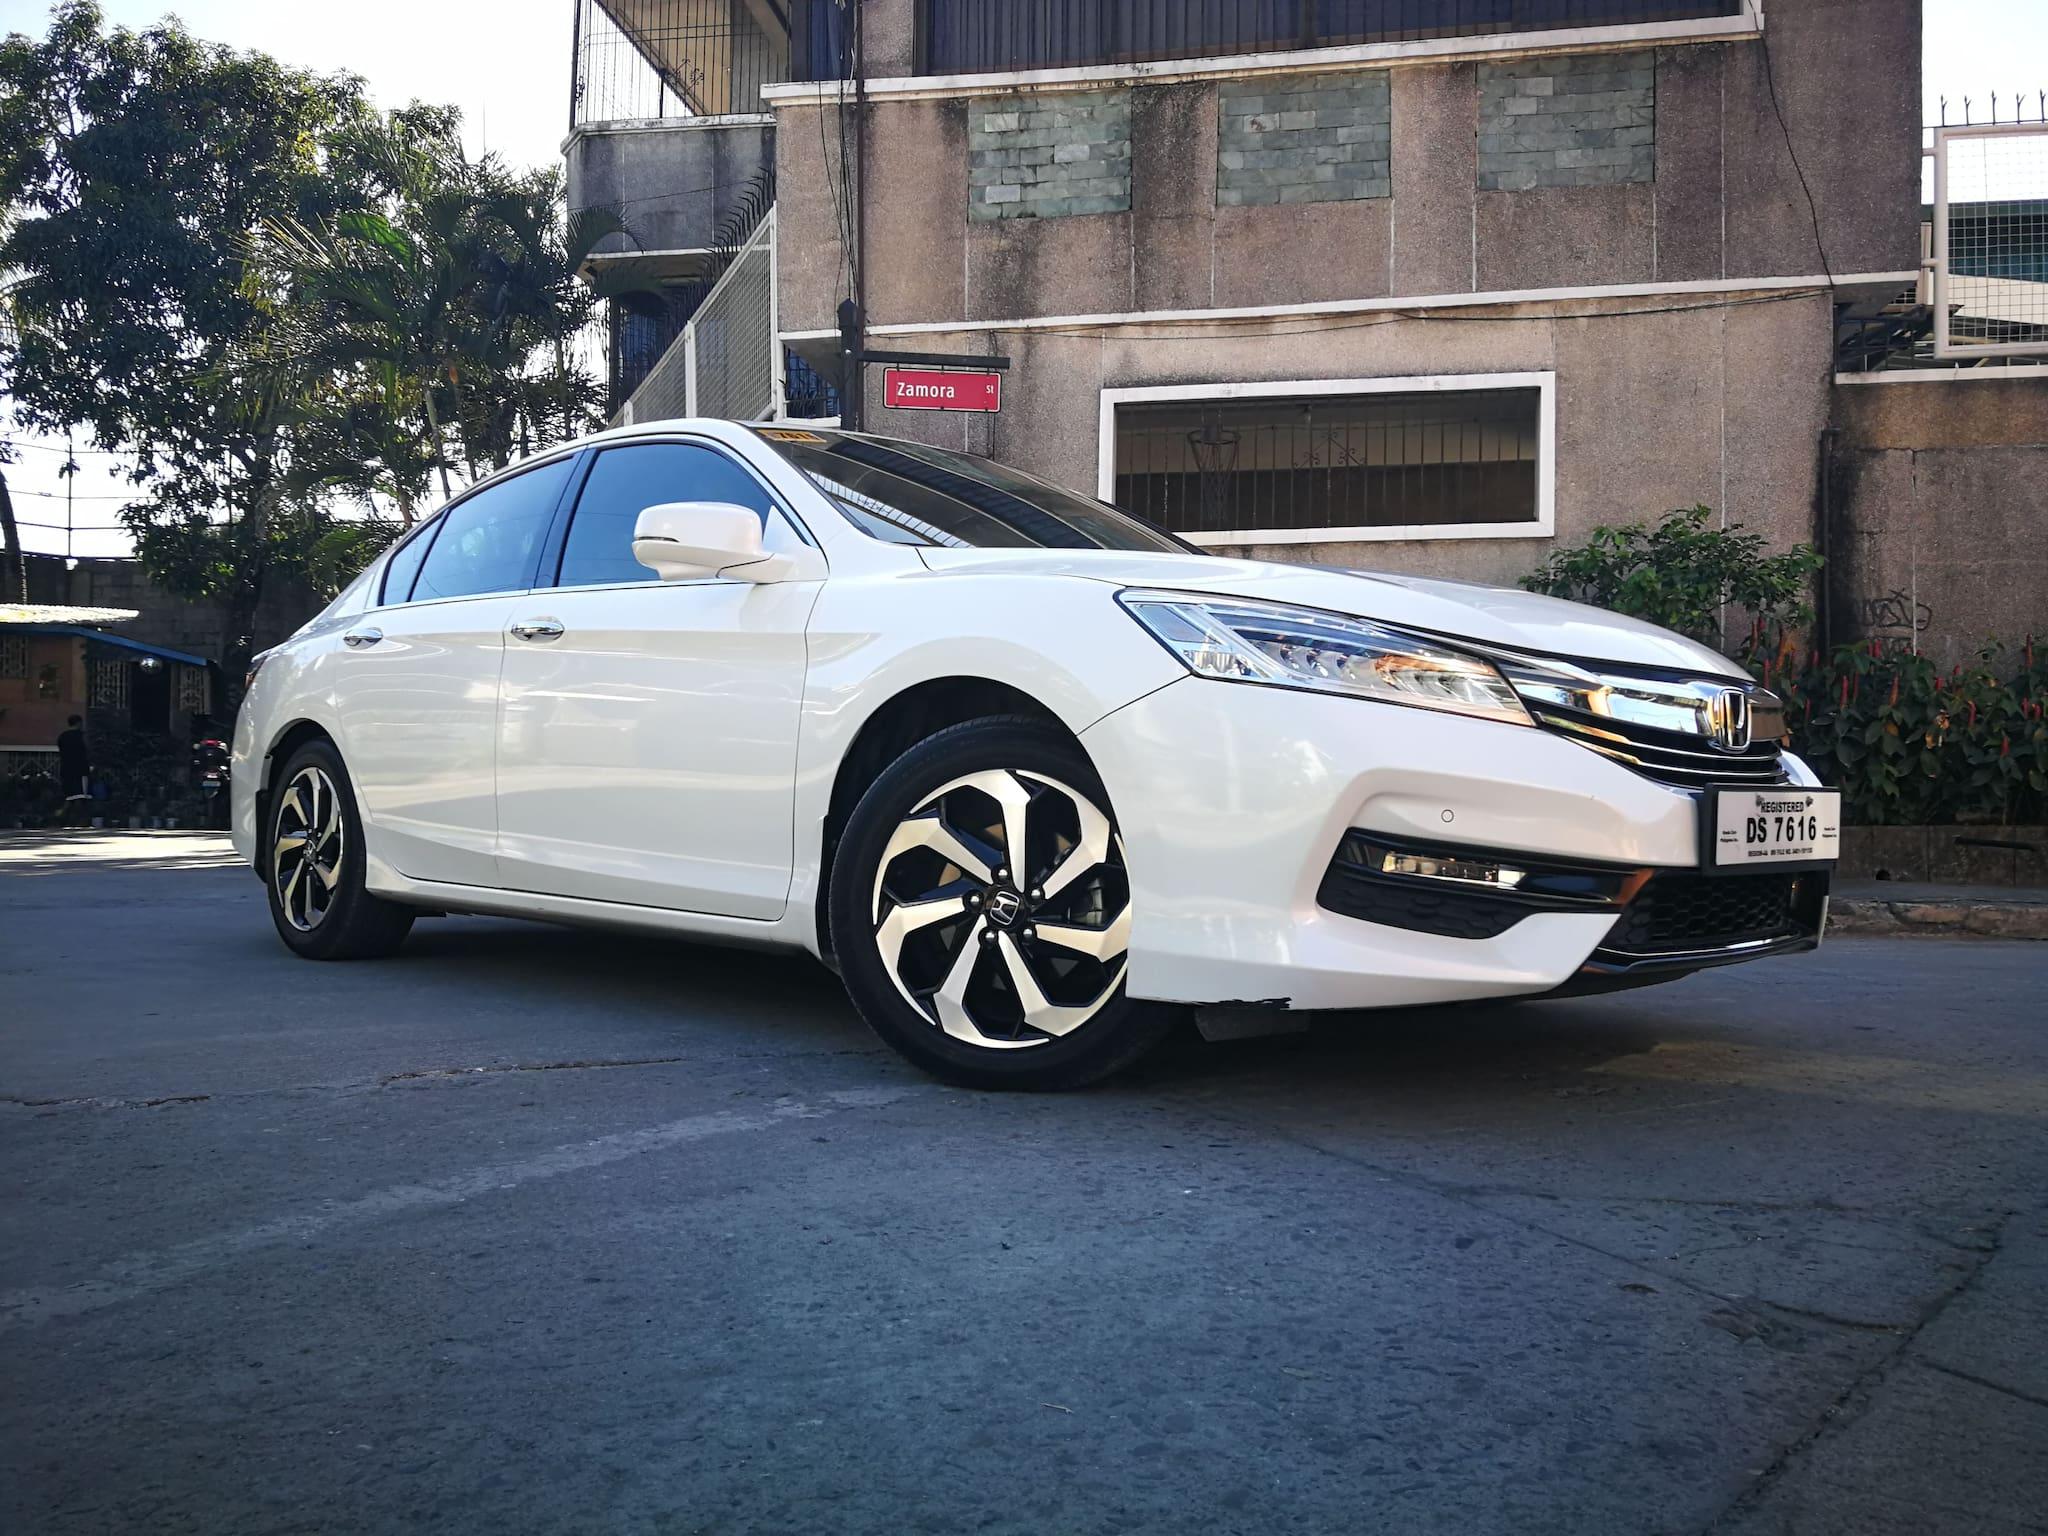 TEST DRIVE: 2018 Honda Accord 2.4 S Navi - Fit to a Tee